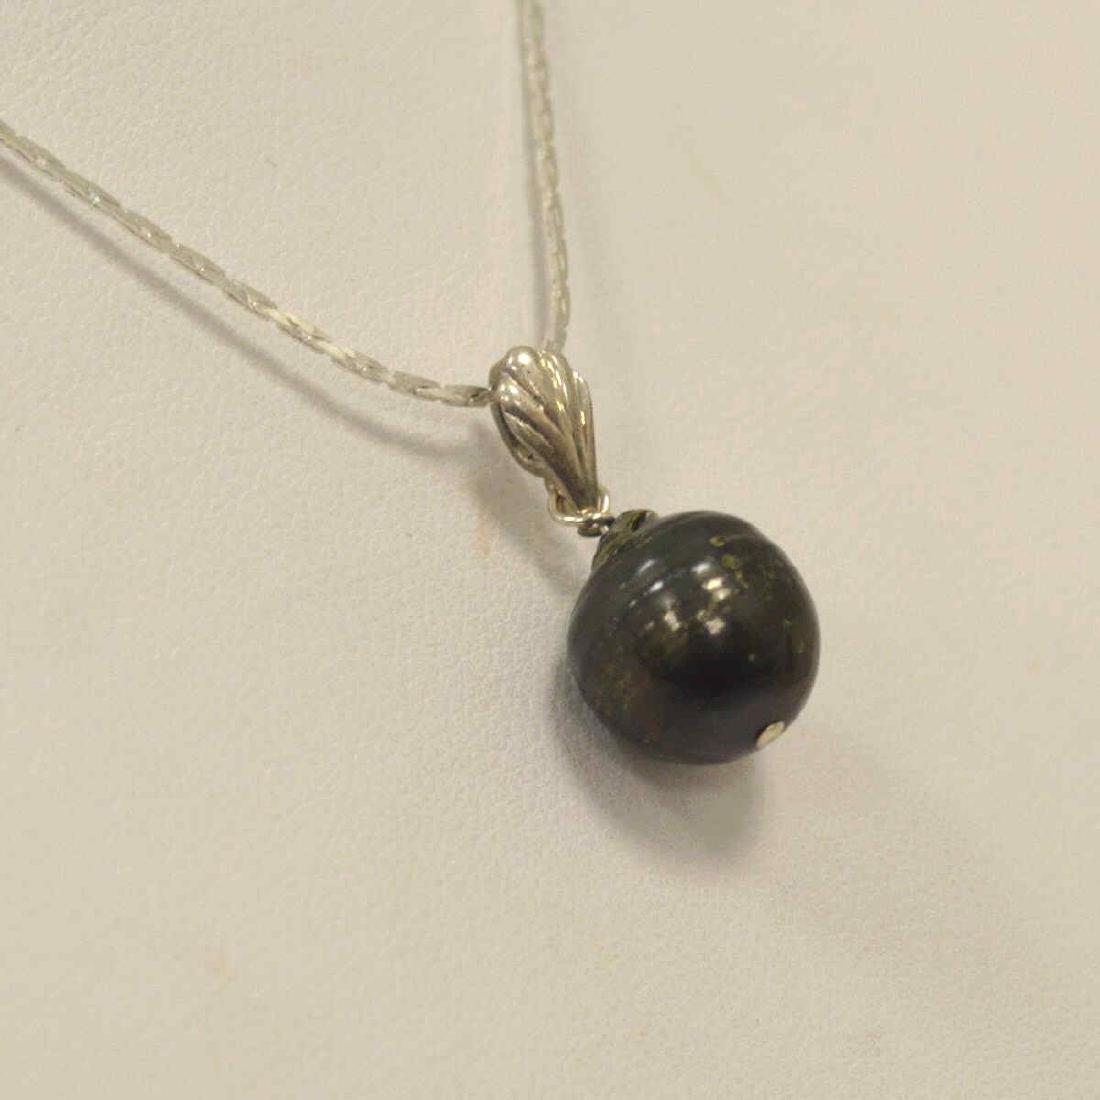 Sterling Silver Black South Sea Pearl Pendant - 3